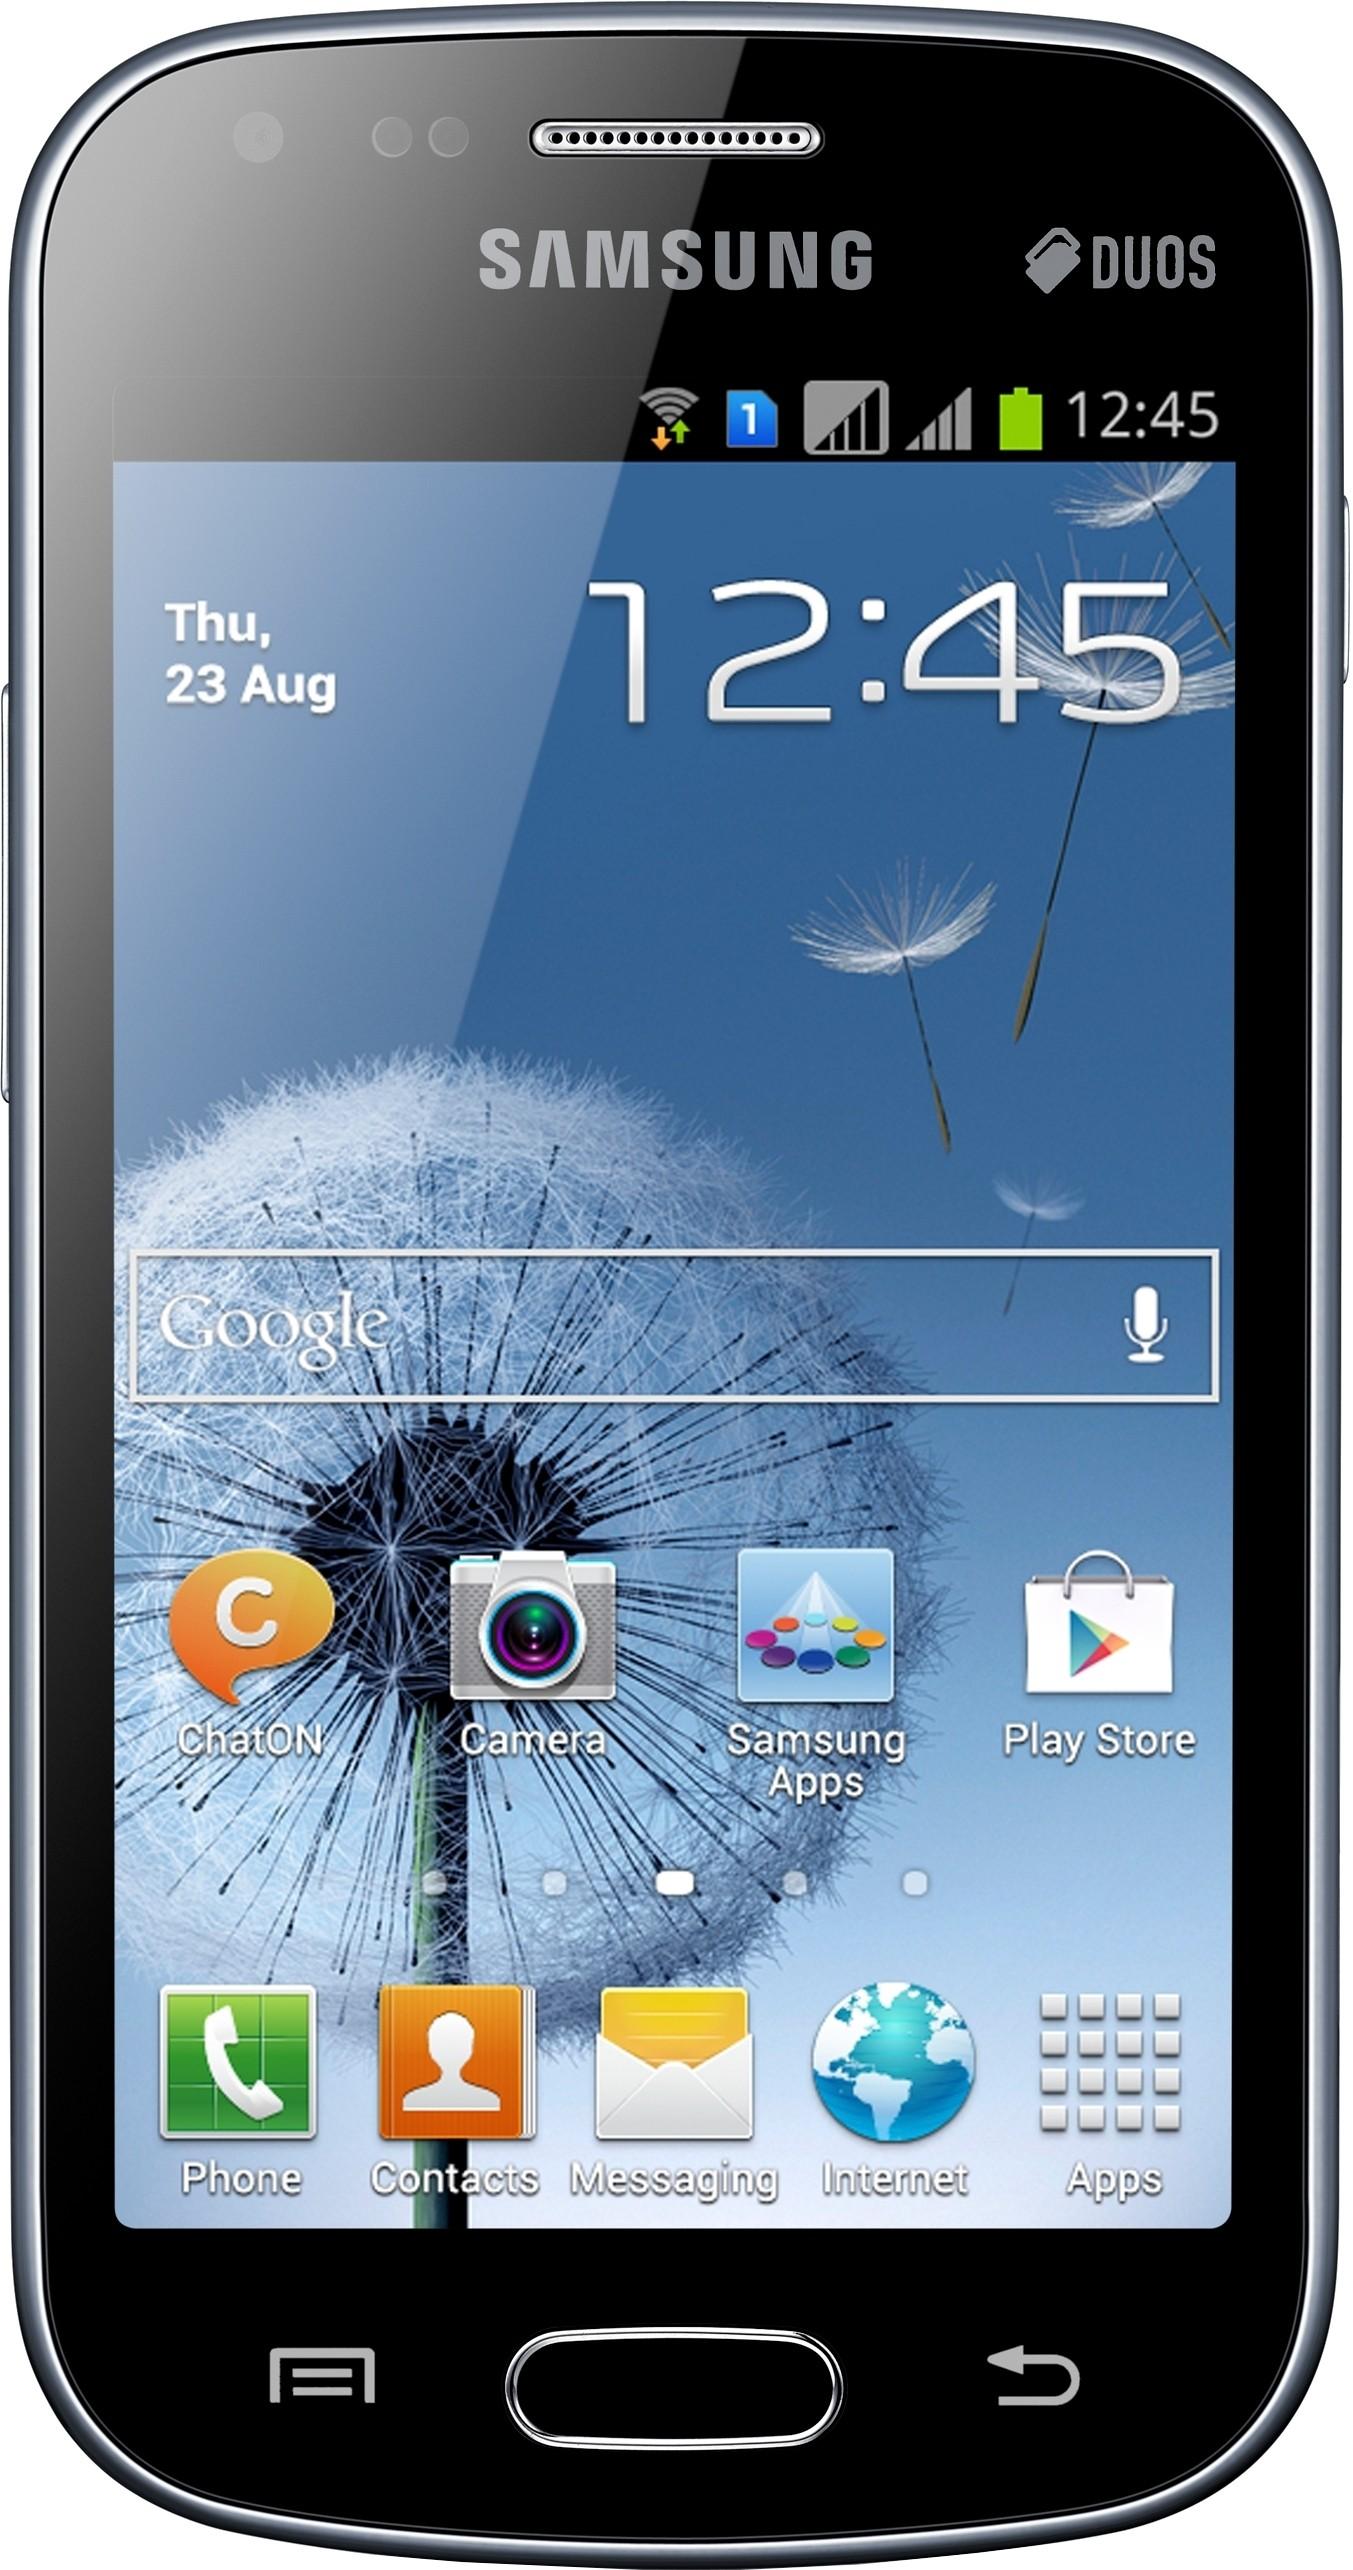 Samsung Galaxy S I9000 (512MB RAM, 16GB)